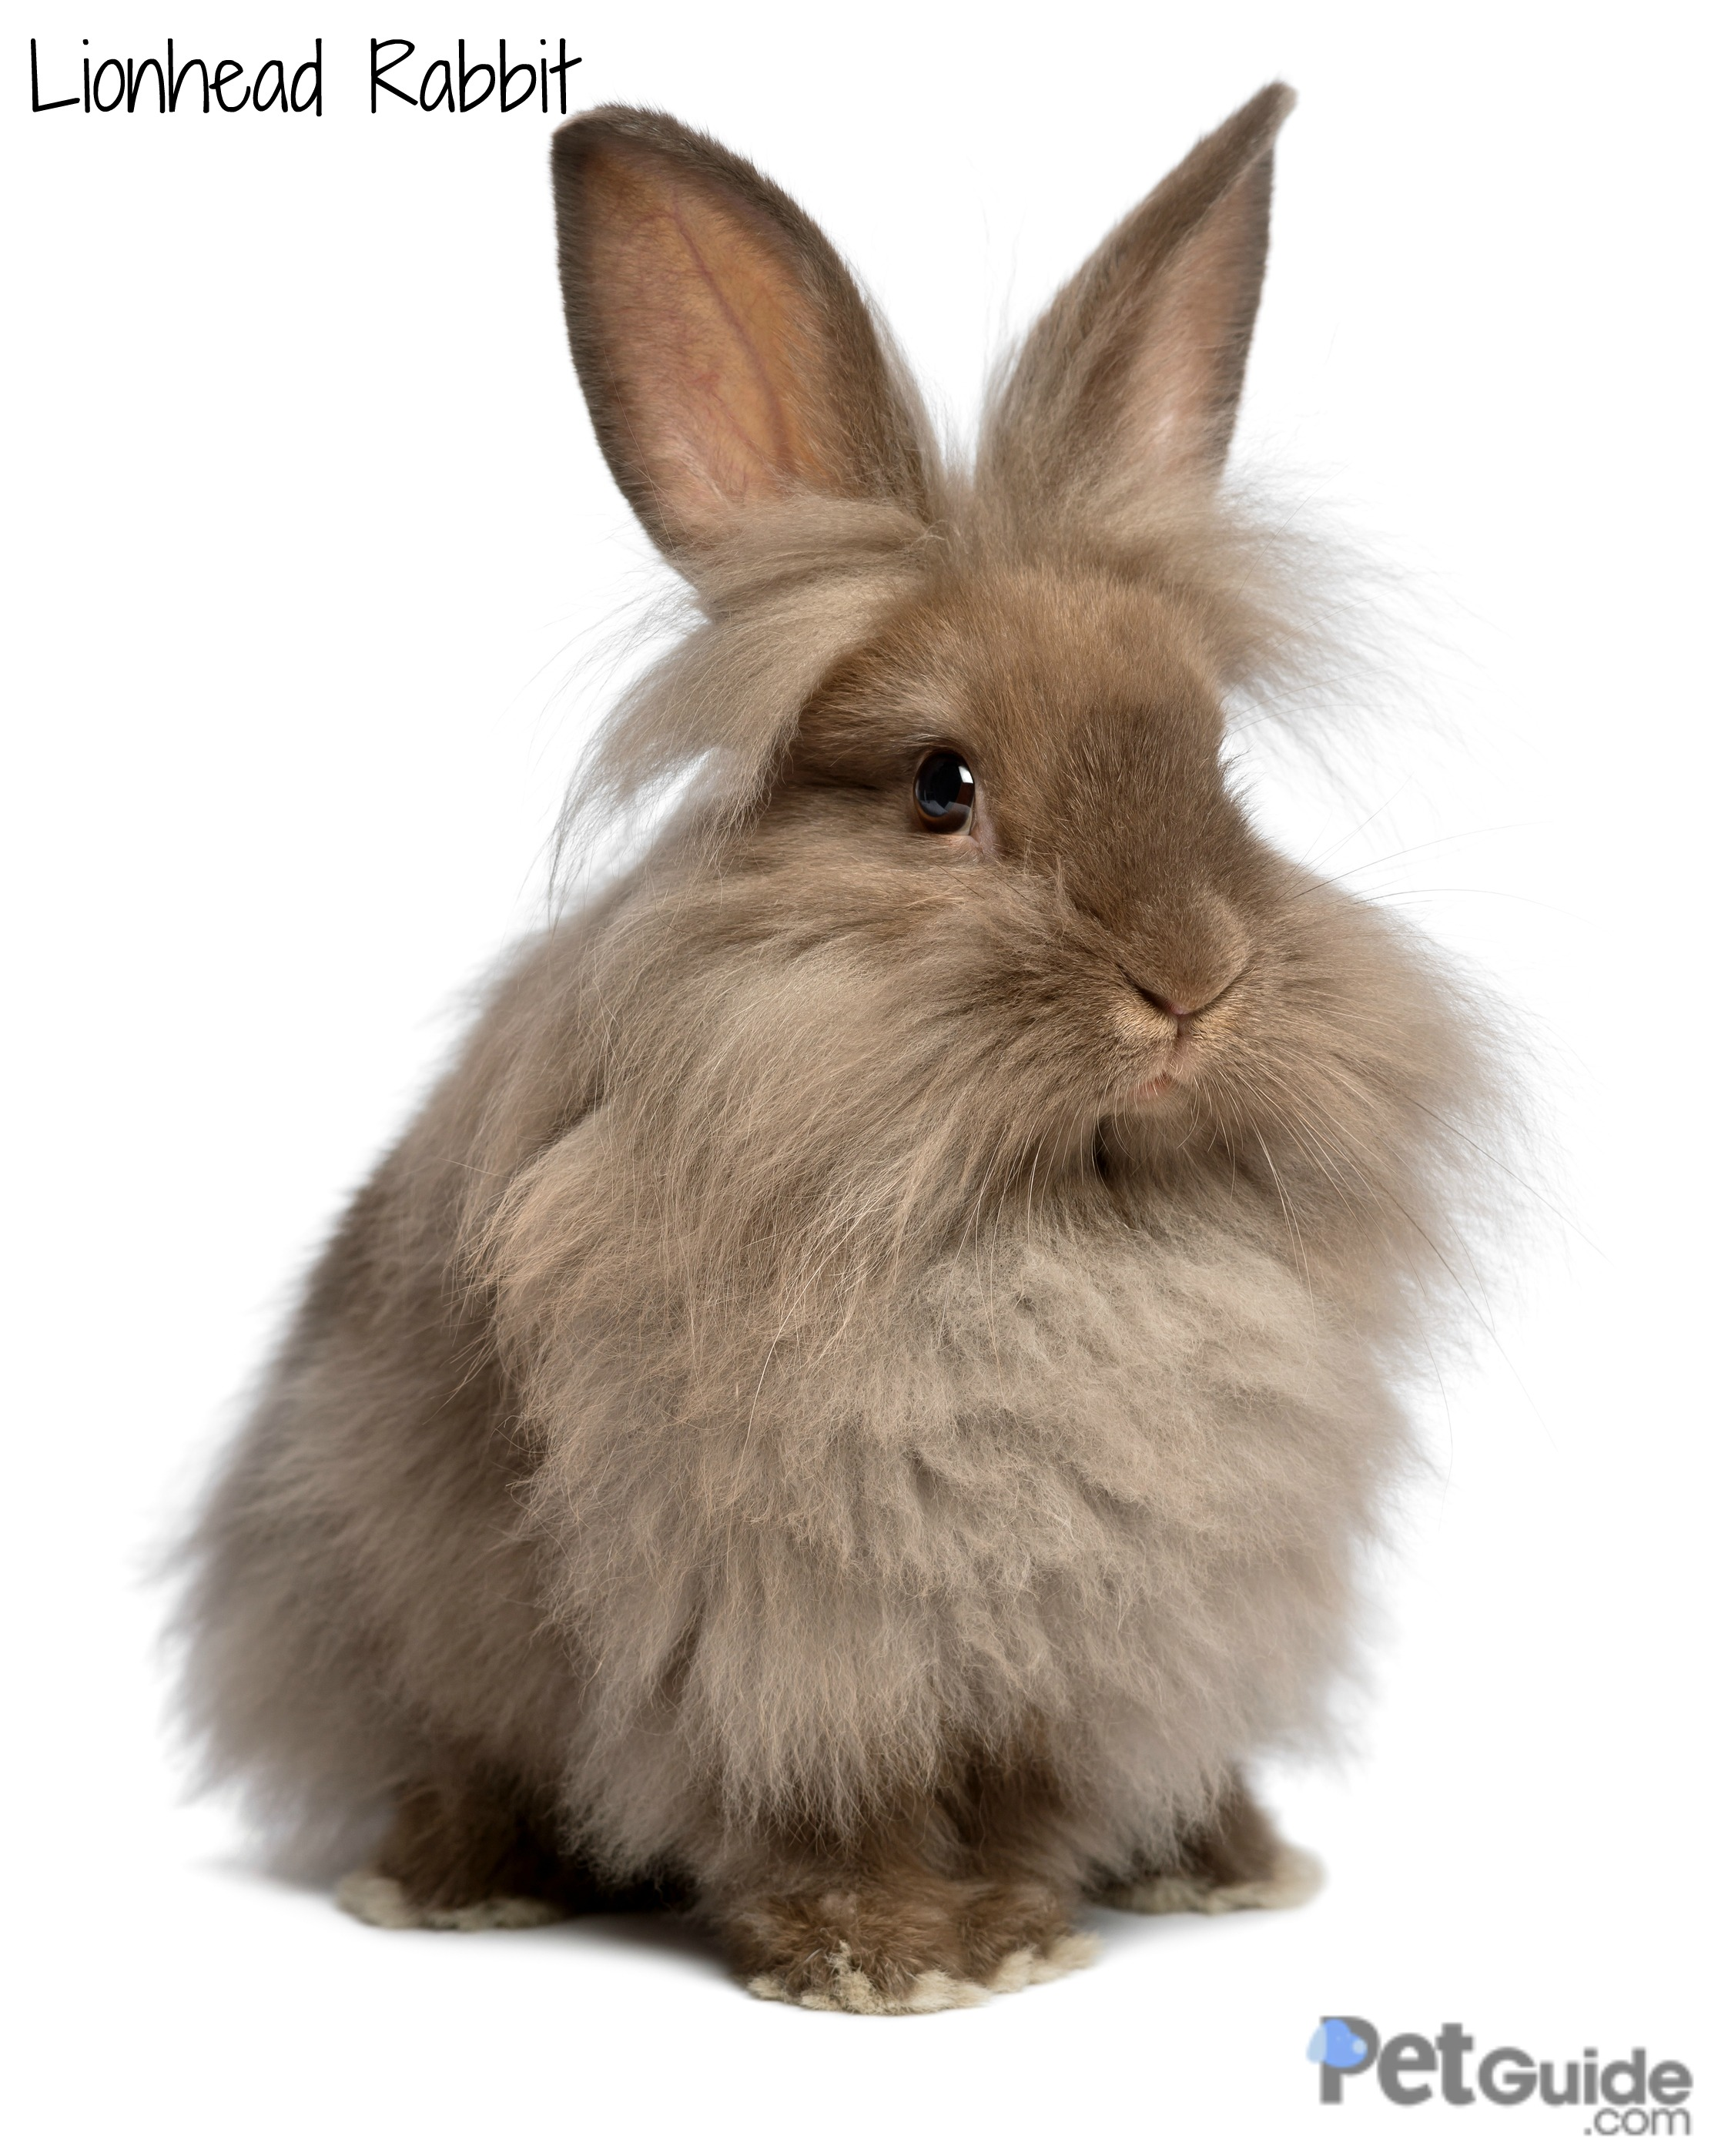 lionhead-rabbit-1.jpg